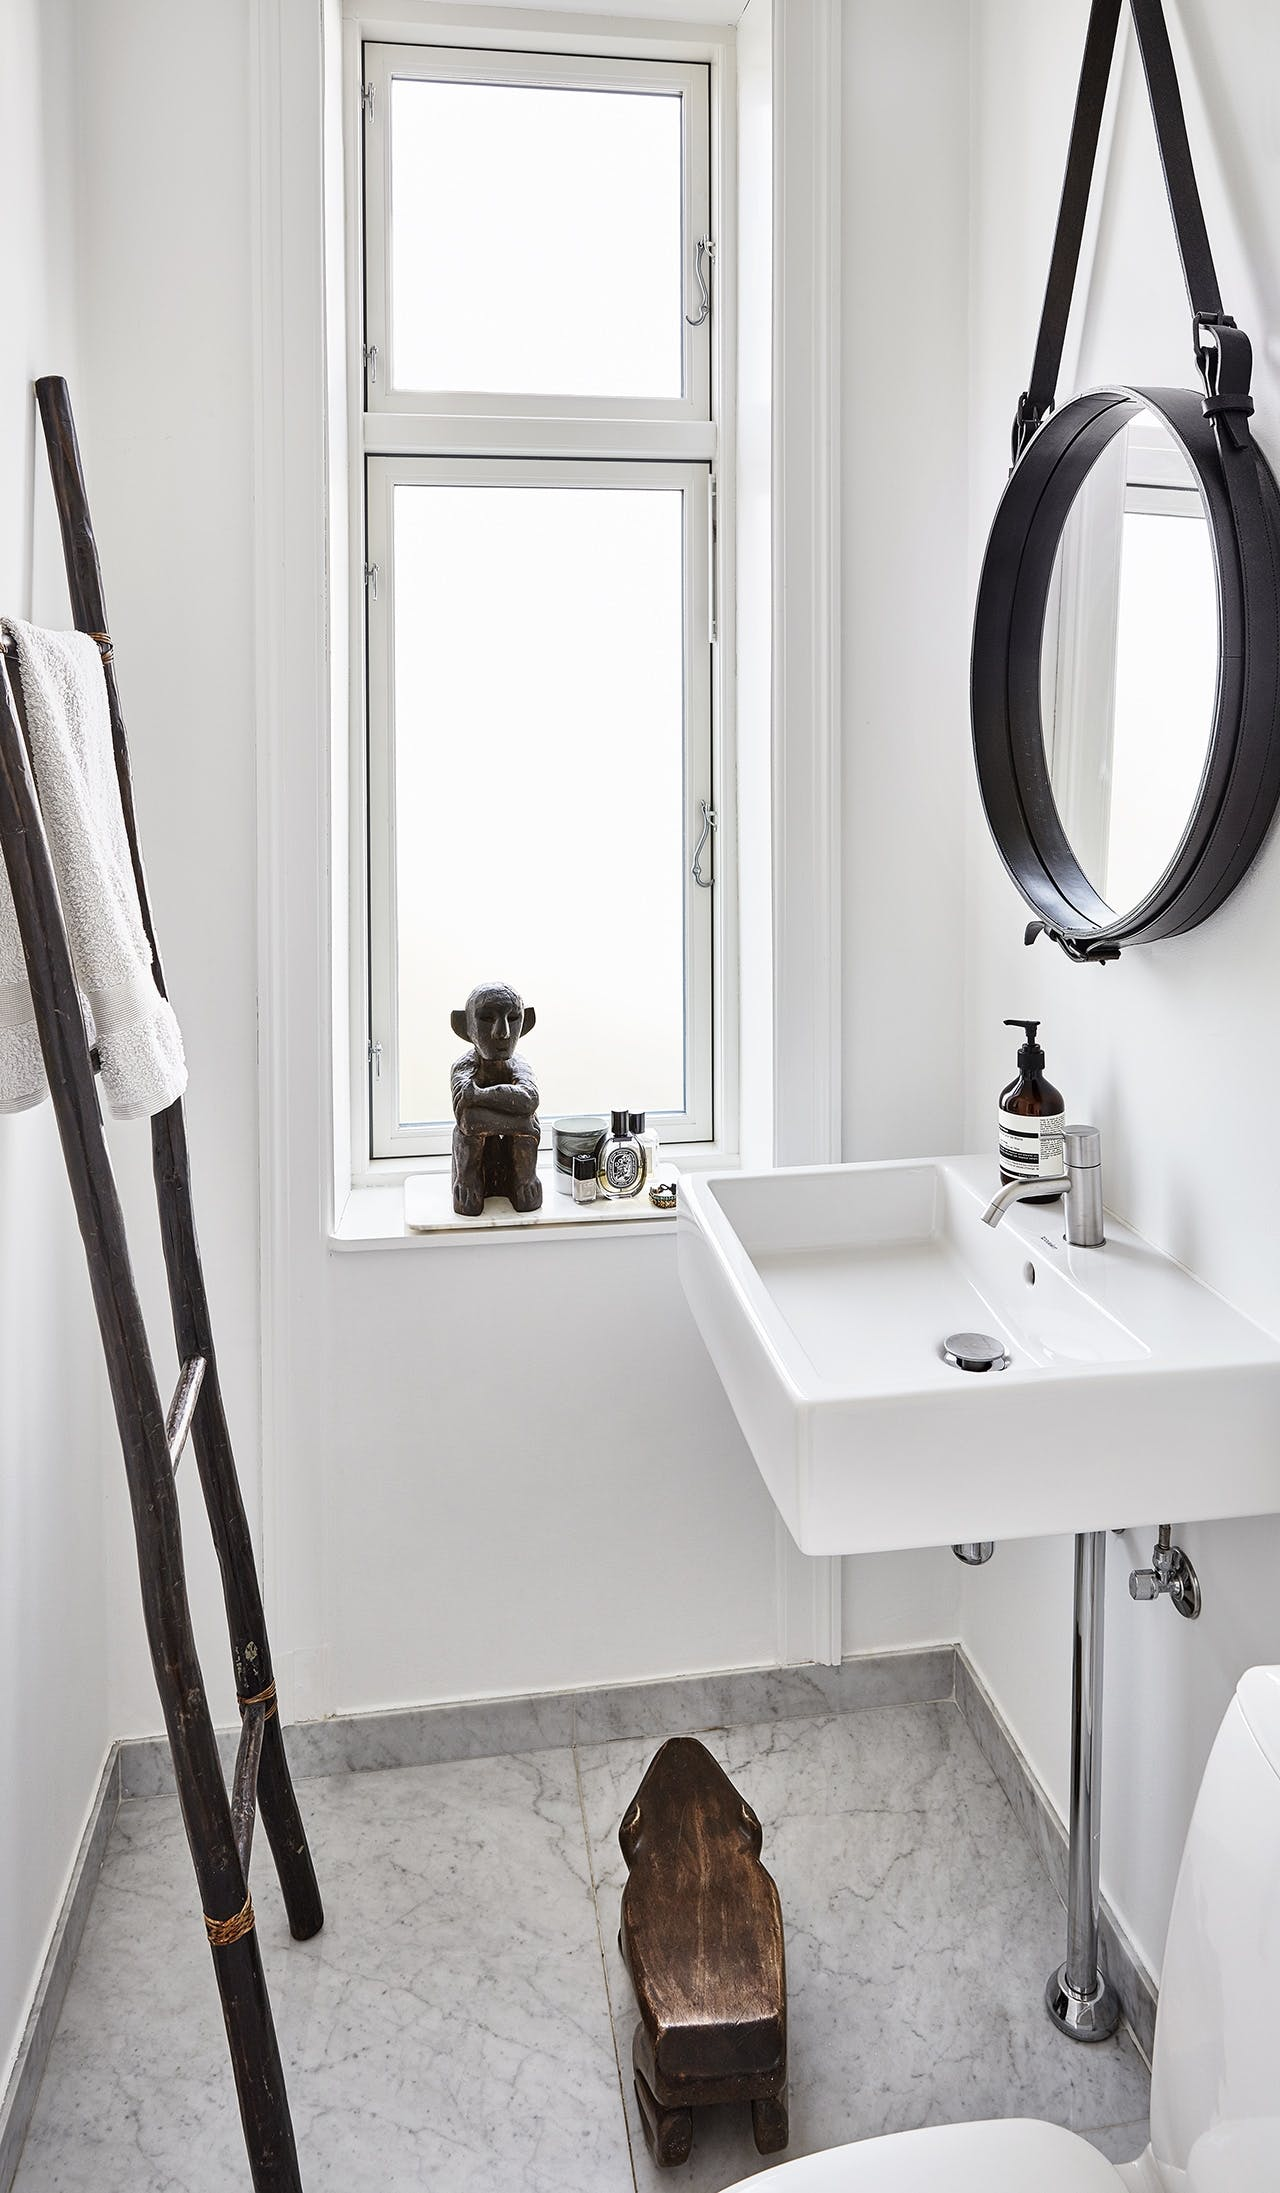 villa herskabsvilla indretning bolig badeværelse spejl